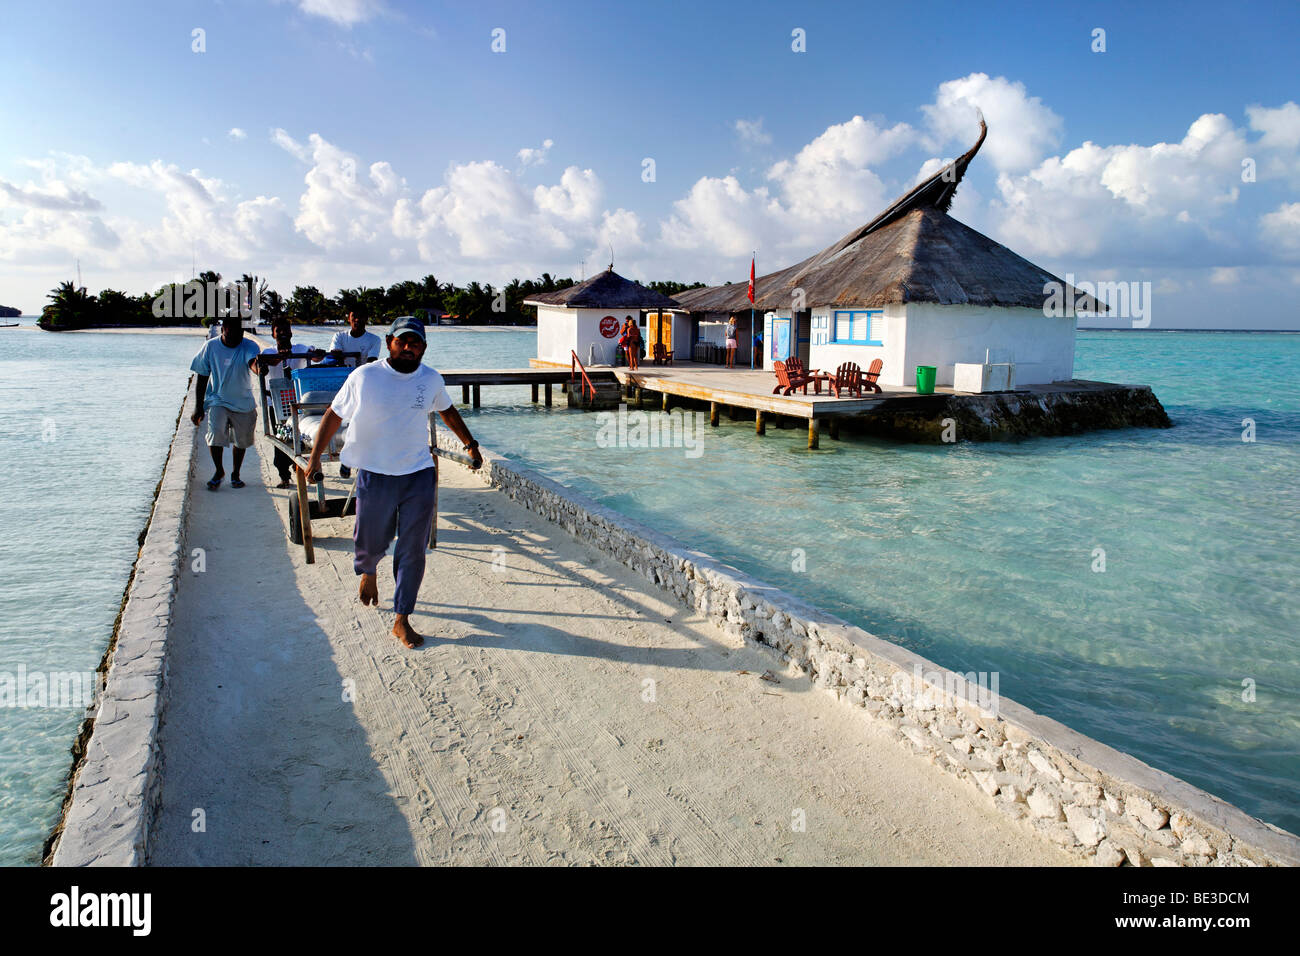 Maldivians at a jetty carry aluminium diving tanks, Maldive island, South Male Atoll, Maldives, Achipelago, Asia, - Stock Image